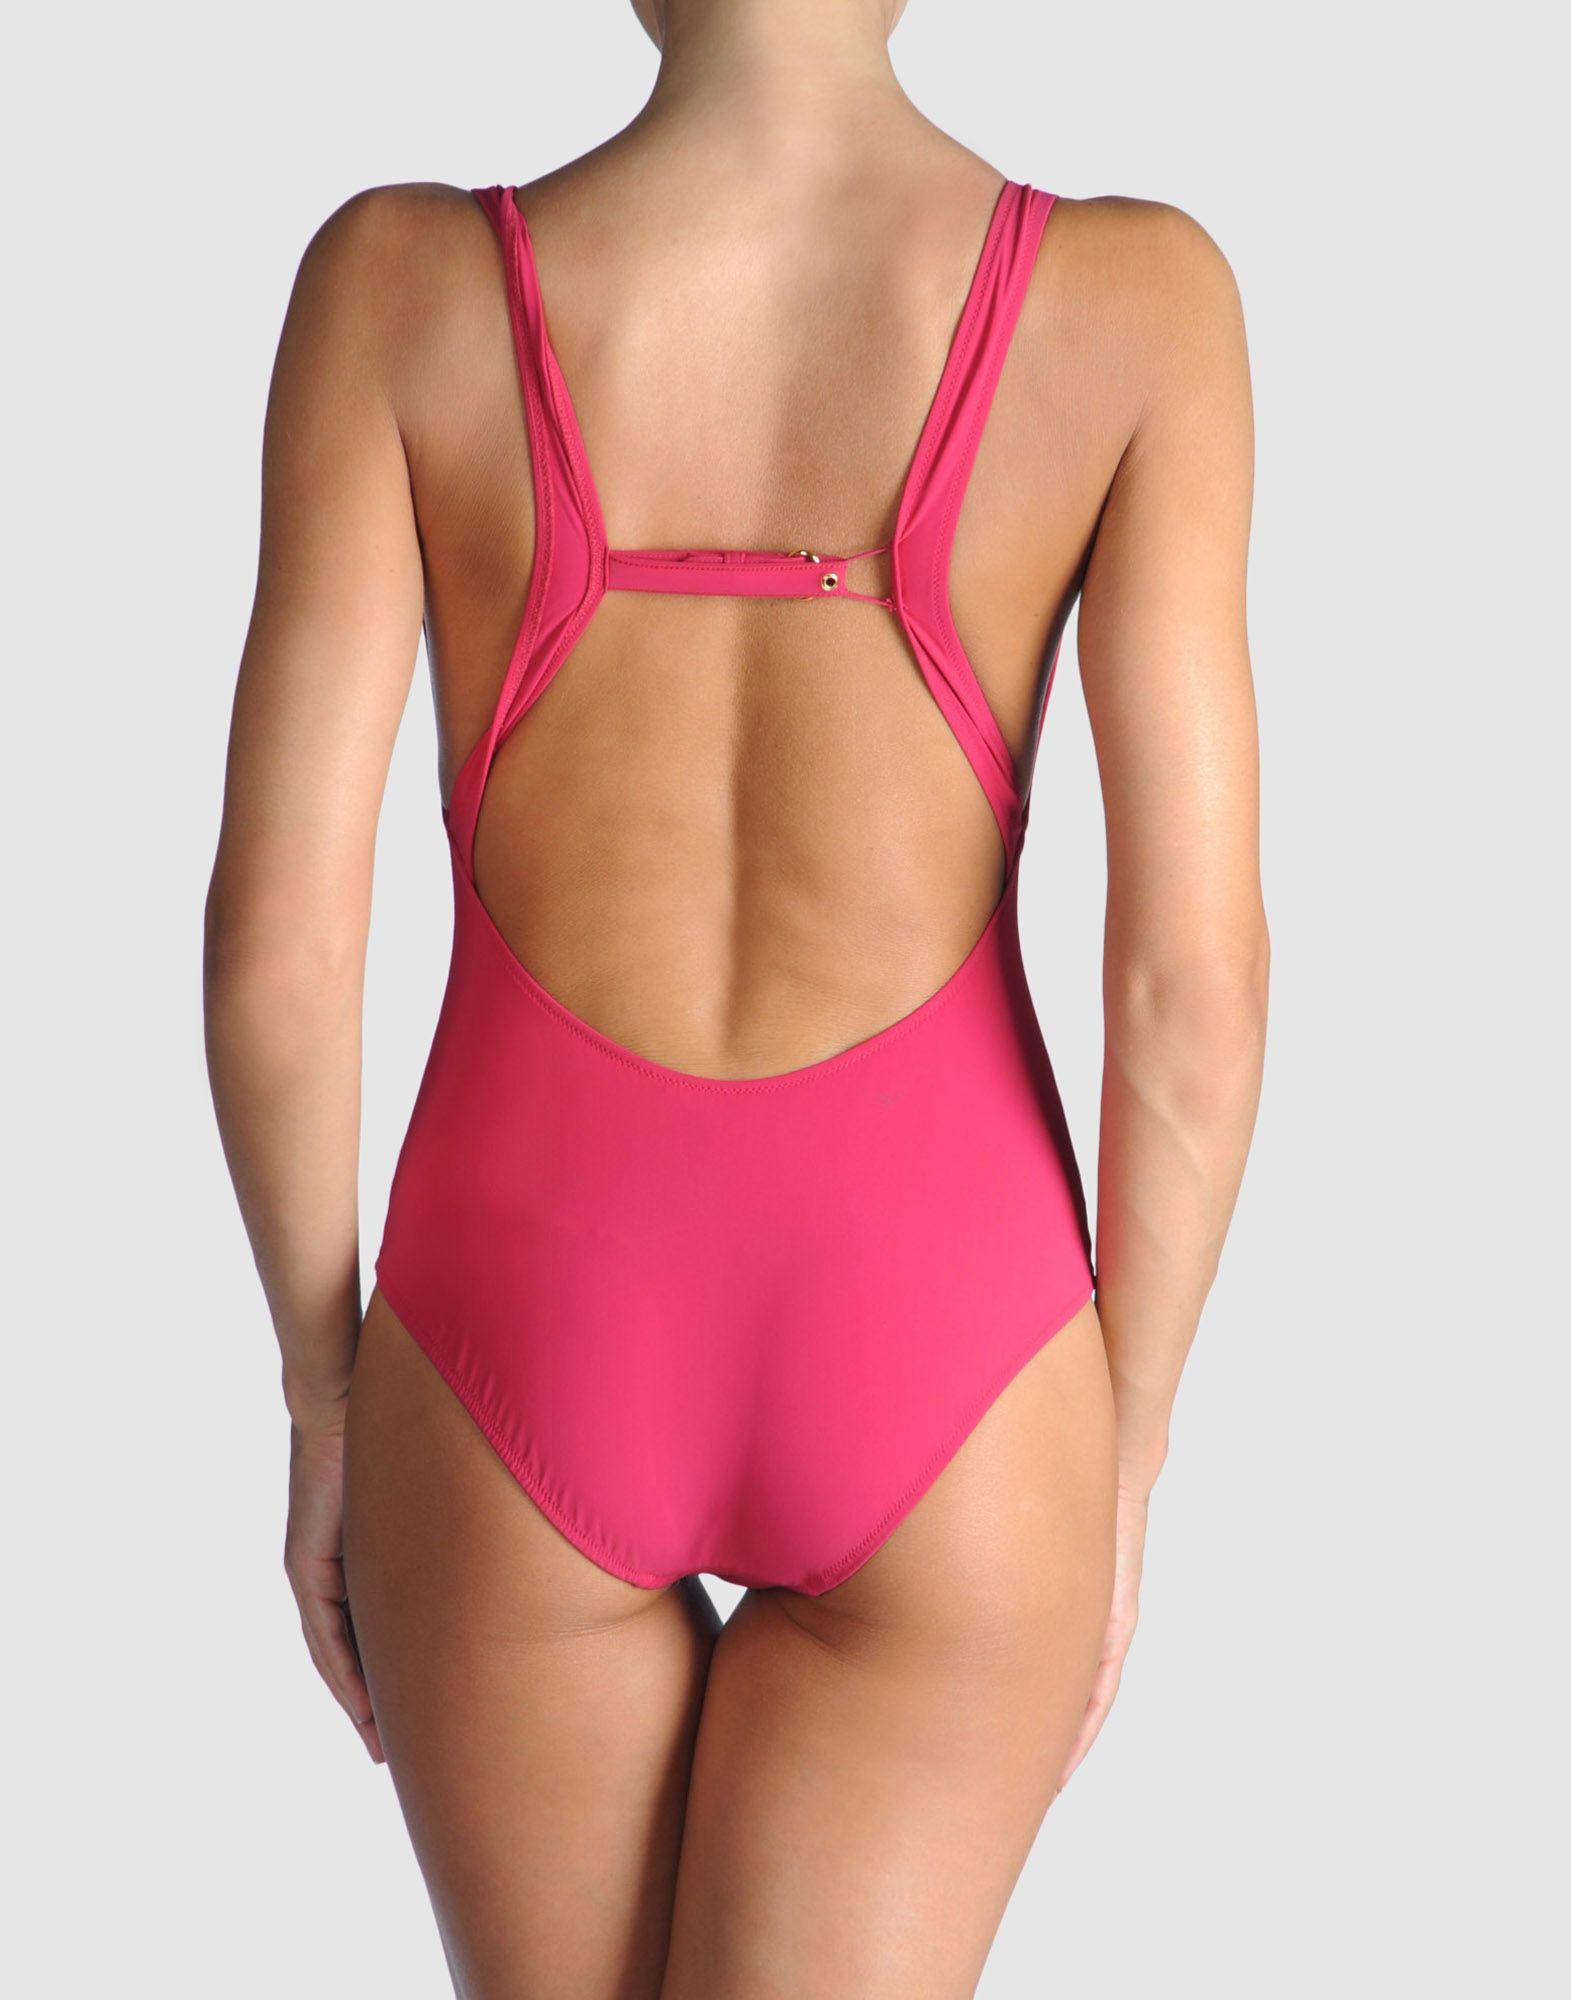 Gucci Swimwear, Bikinis & Swimsuits   Lyst